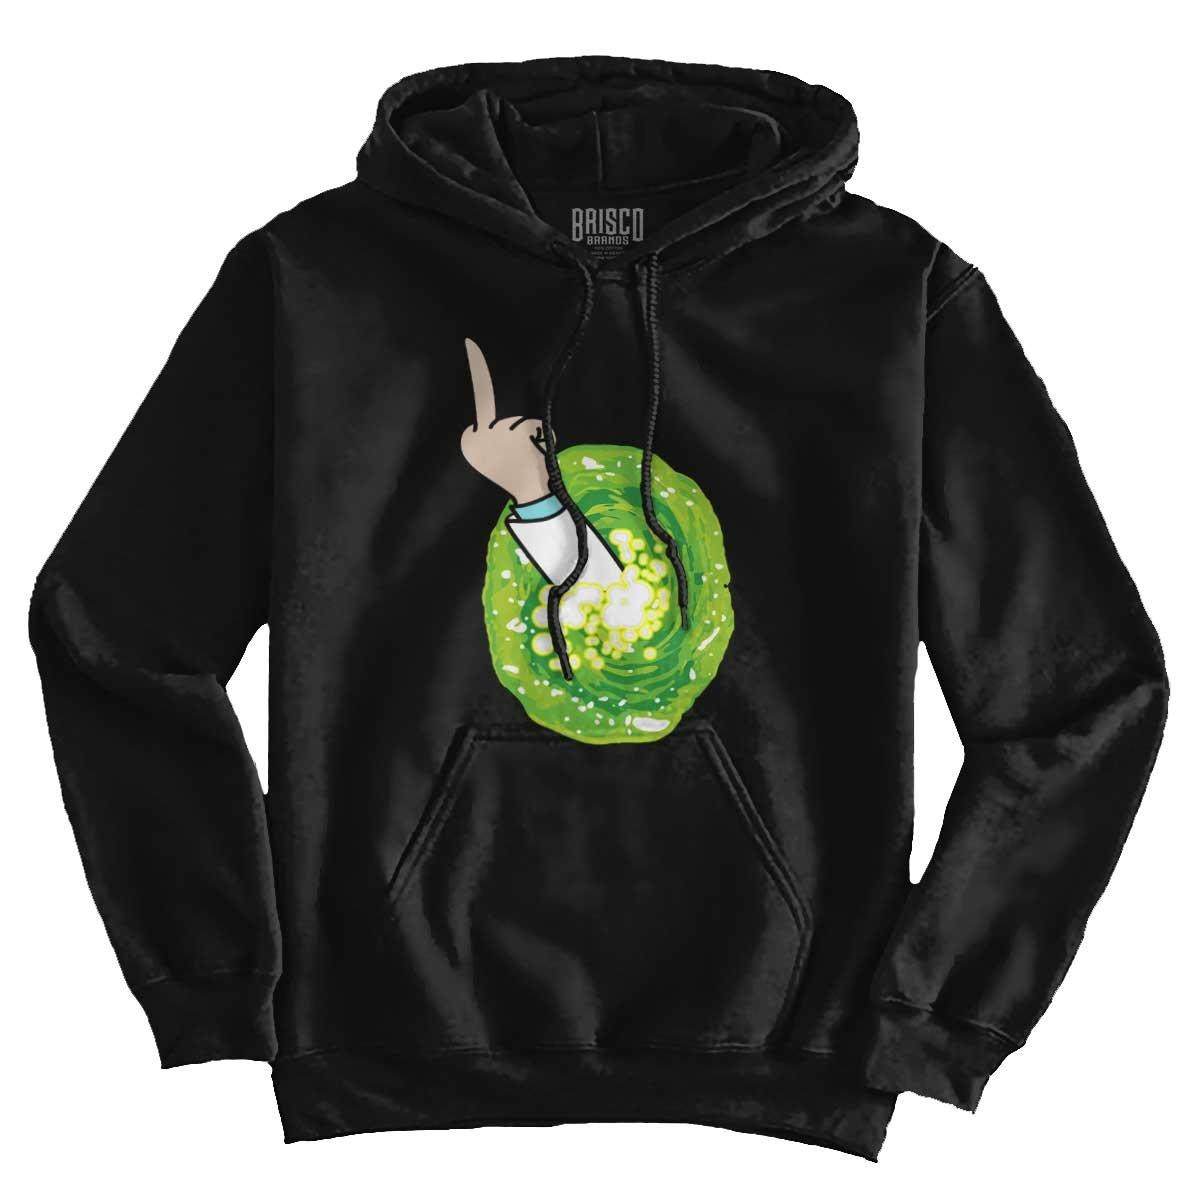 Brisco Brands Portal Rick Sanchez Schwifty Cool Funny Morty GLIP Glop Edgy Hoodie Sweatshirt by Brisco Brands (Image #3)